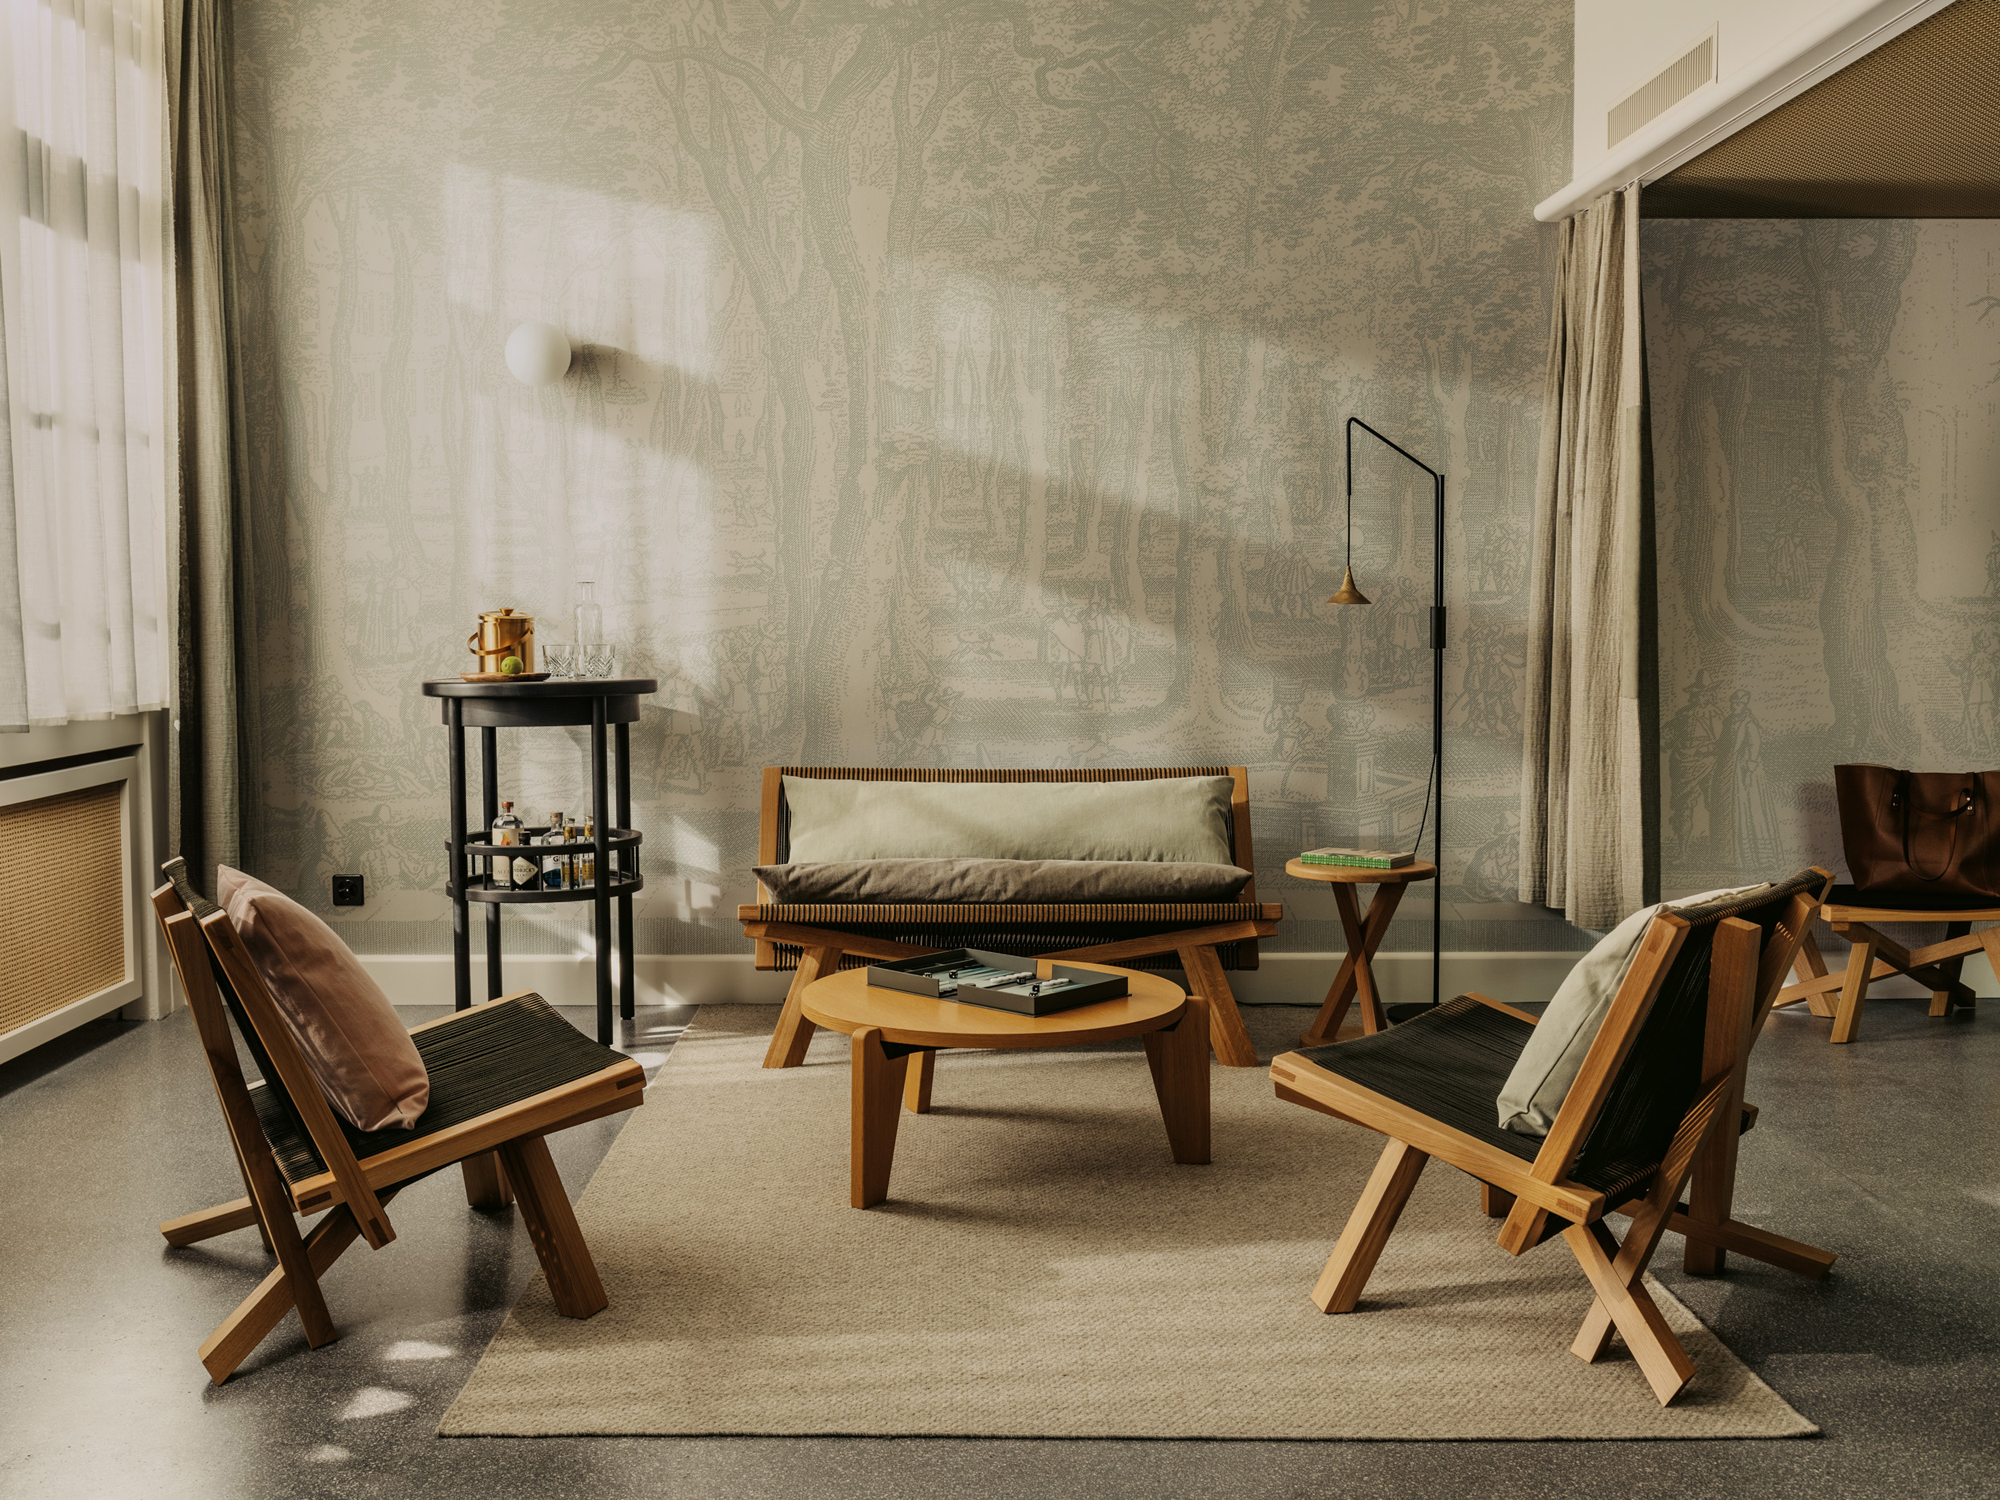 Herzog & de Meurons neues Boutique-Hotel in Basel